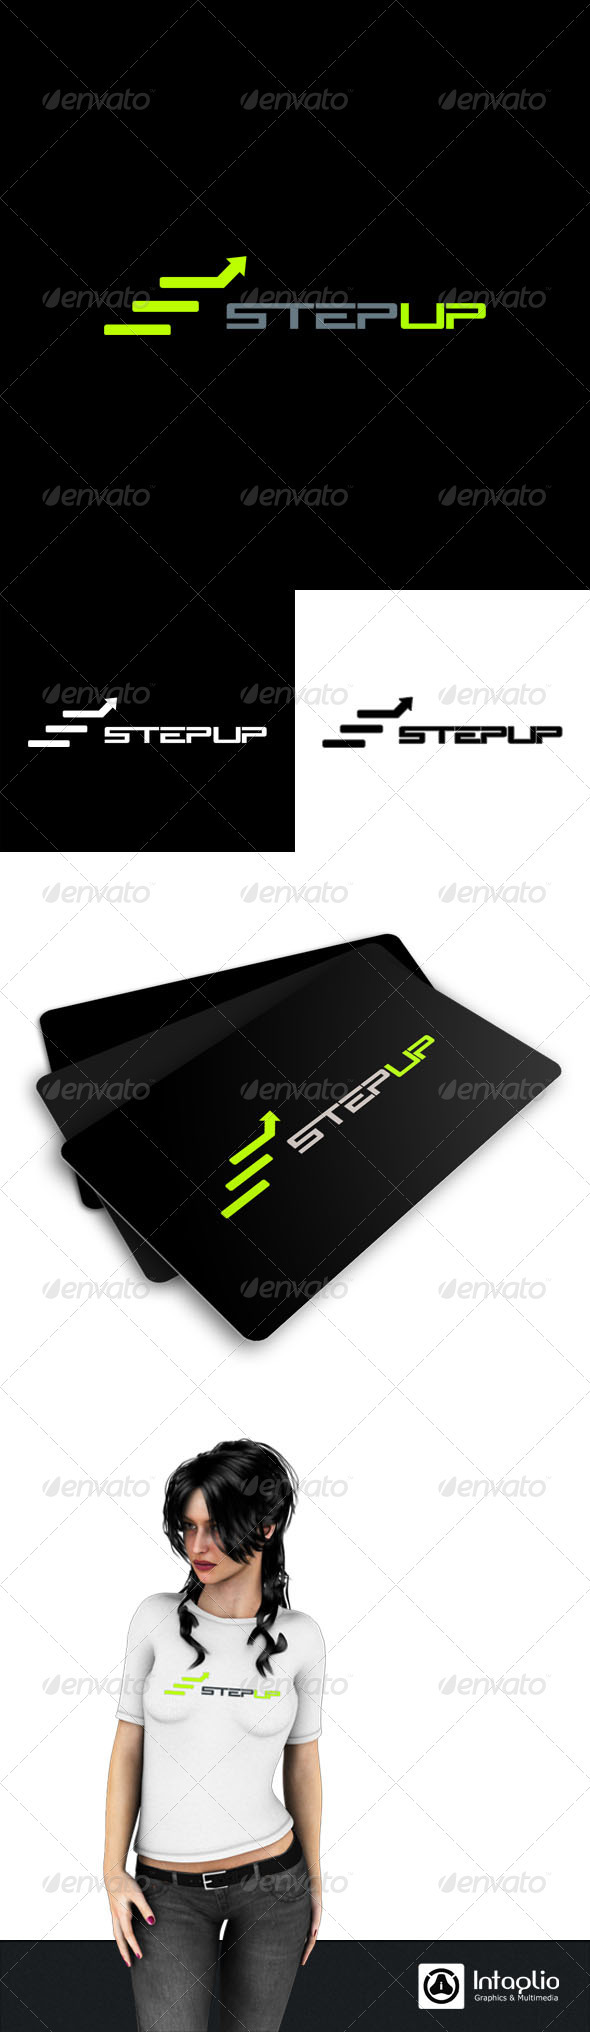 StepUp Logo Template - Vector Abstract